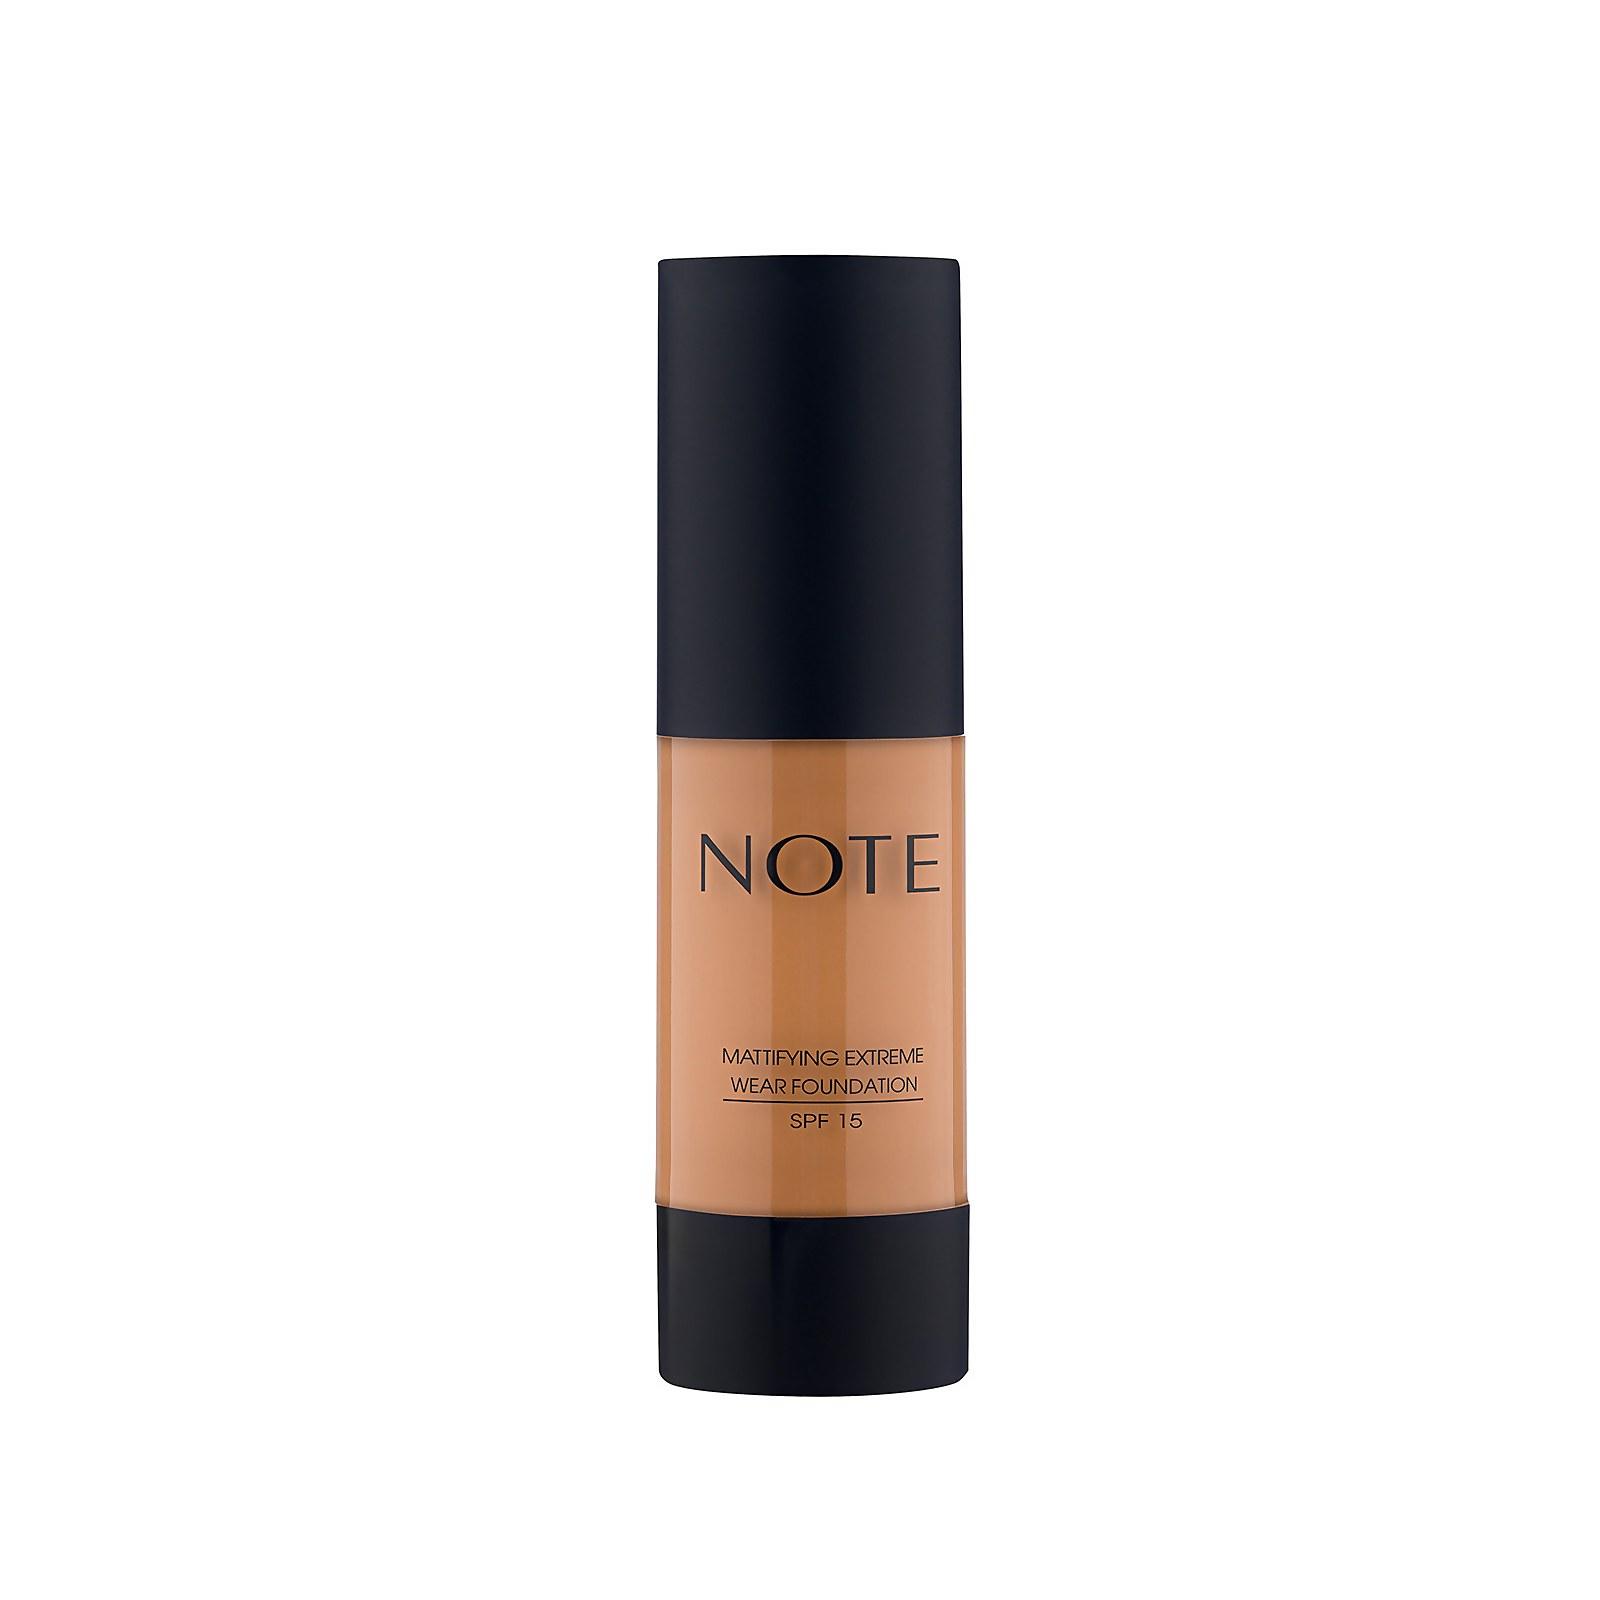 Купить Note Cosmetics Mattifying Extreme Wear Foundation 35ml (Various Shades) - 123 Golden Caramel